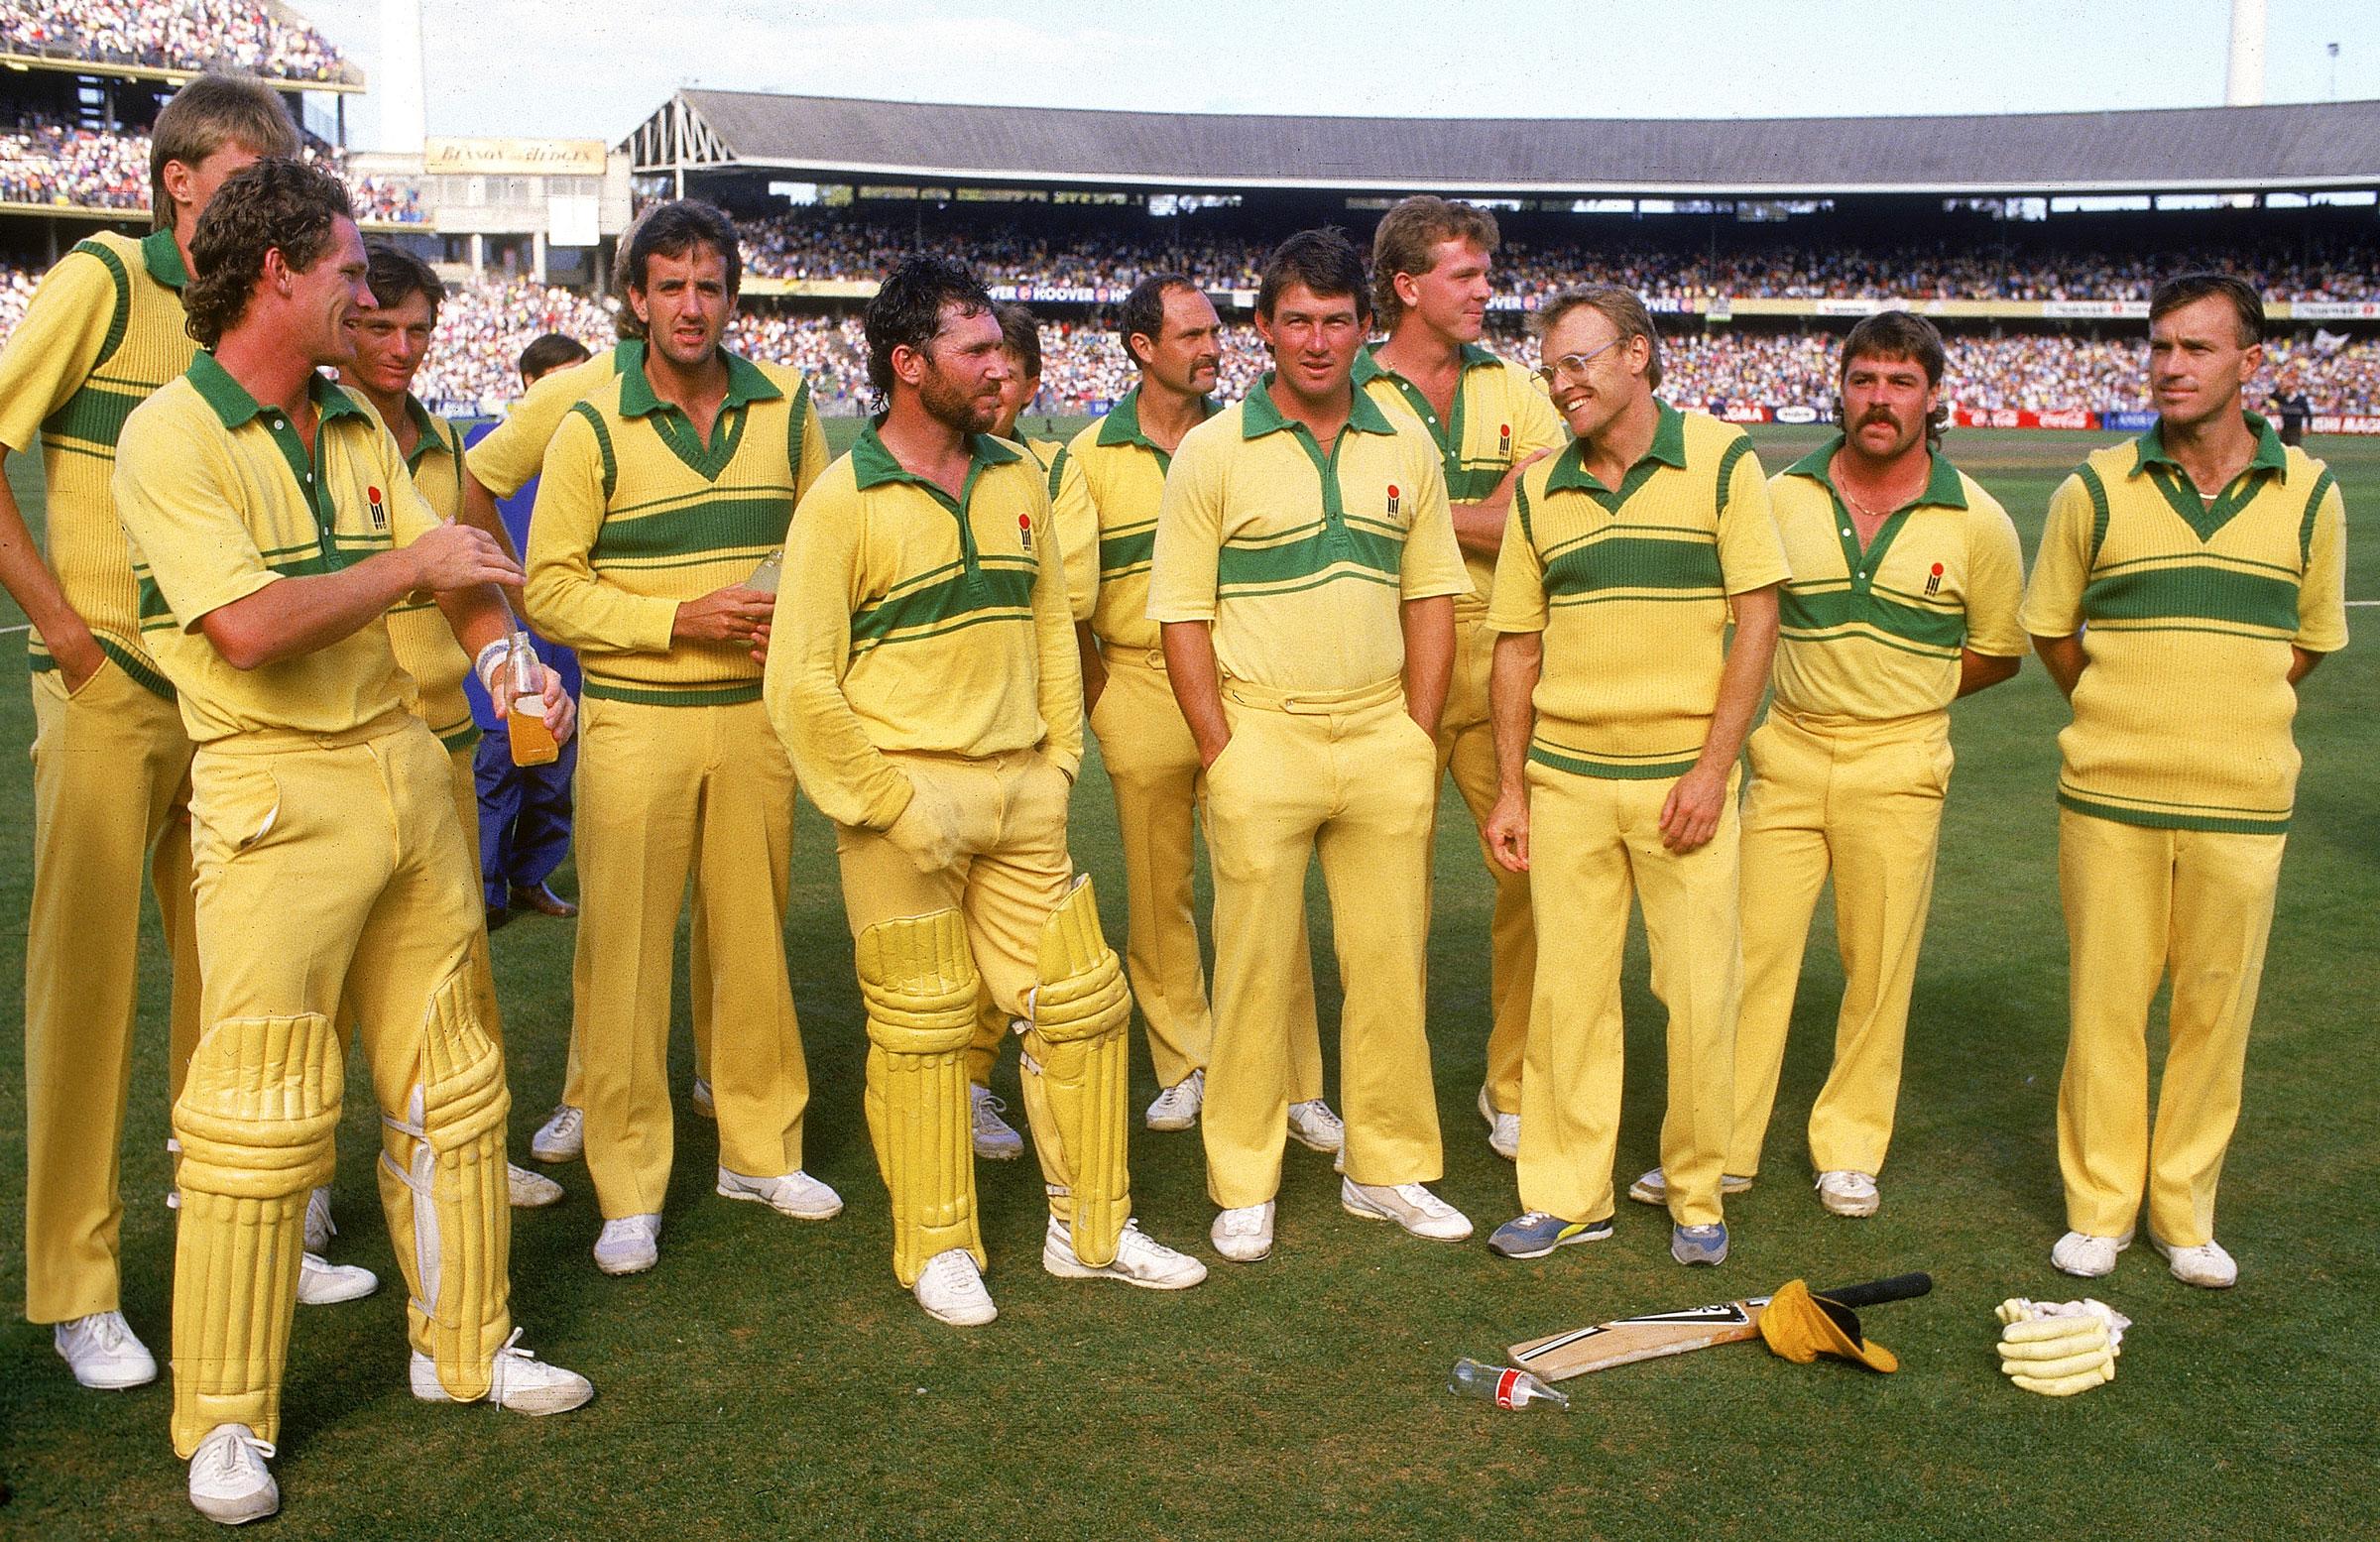 Australia's ODI side in 1986 // Getty Images